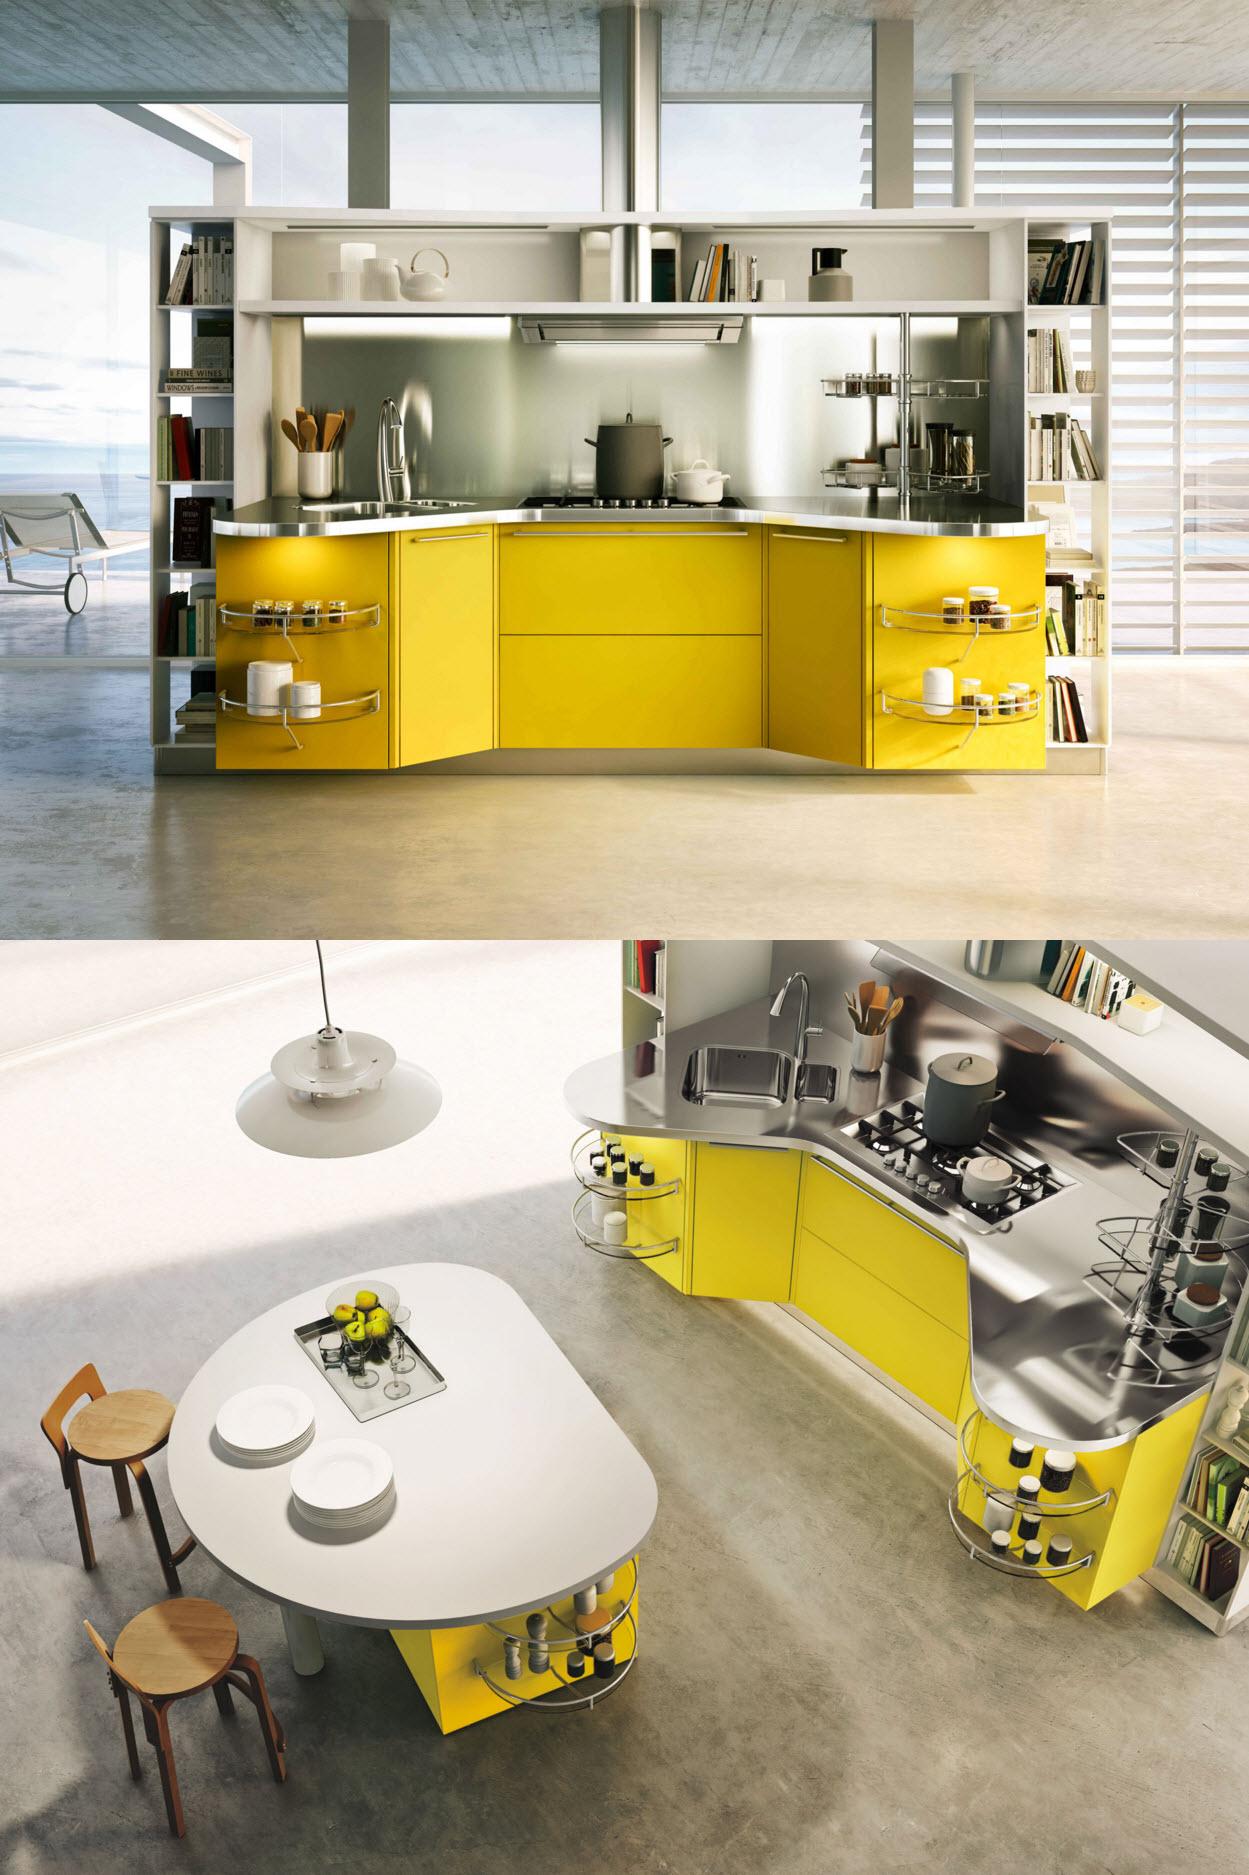 Ideas y dise o de cocinas modernas construye hogar for Cosas modernas para el hogar